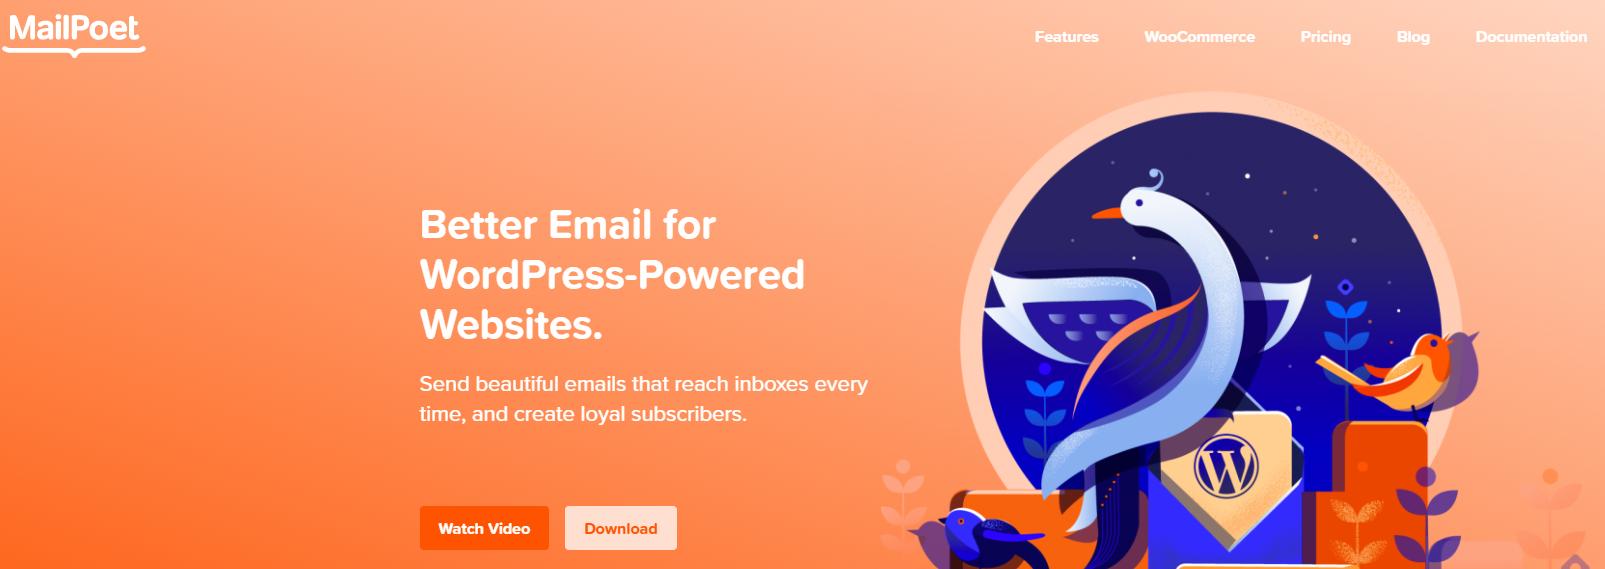 2020 05 12 16 31 39 MailPoet a newsletter plugin for WordPress